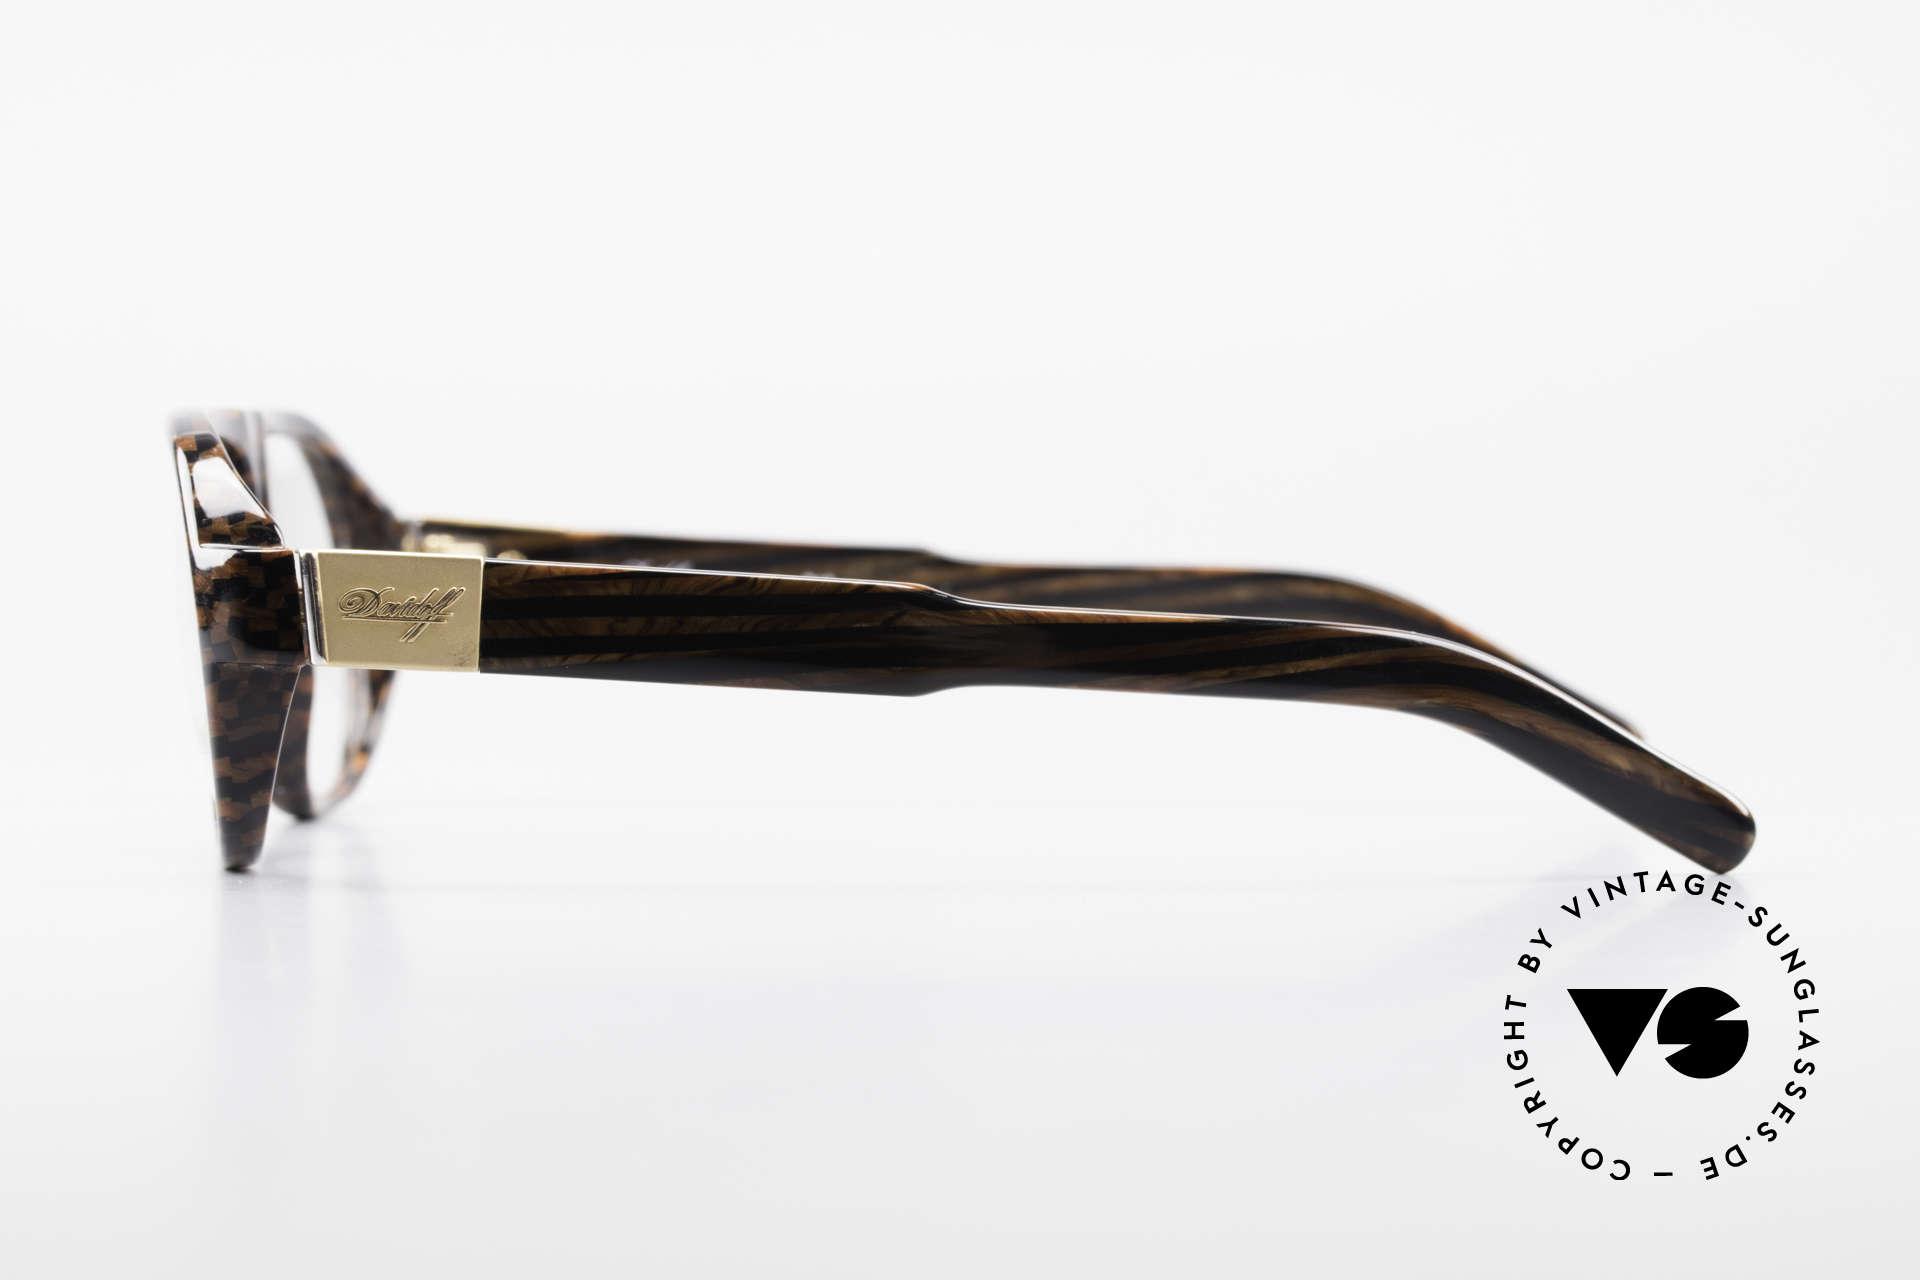 Davidoff 100 90's Men's Vintage Glasses, Size: medium, Made for Men